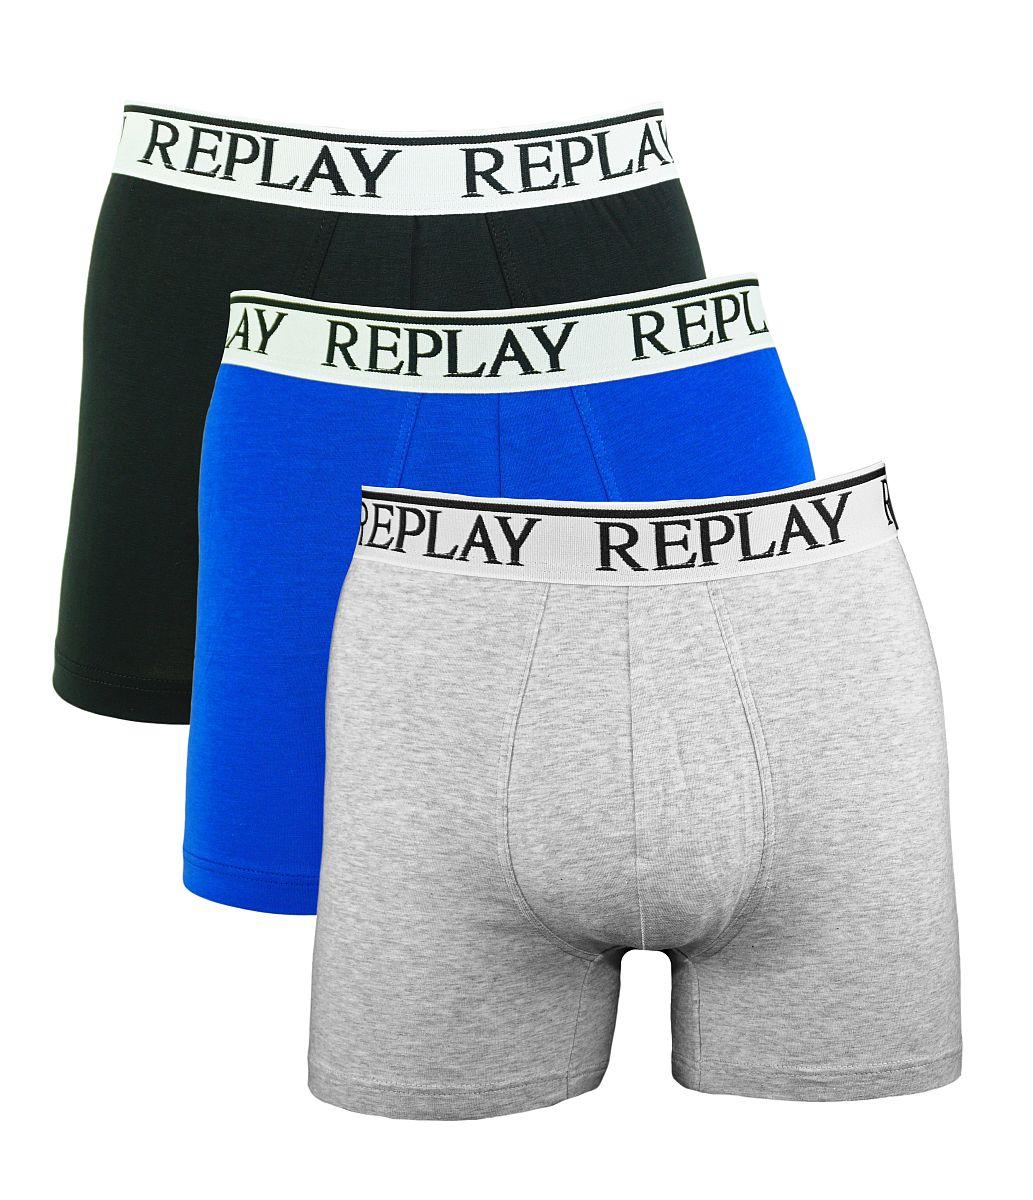 Replay 3er Pack Shorts Boxershorts M605001 E56 schwarz, blau, grau W18-RY1